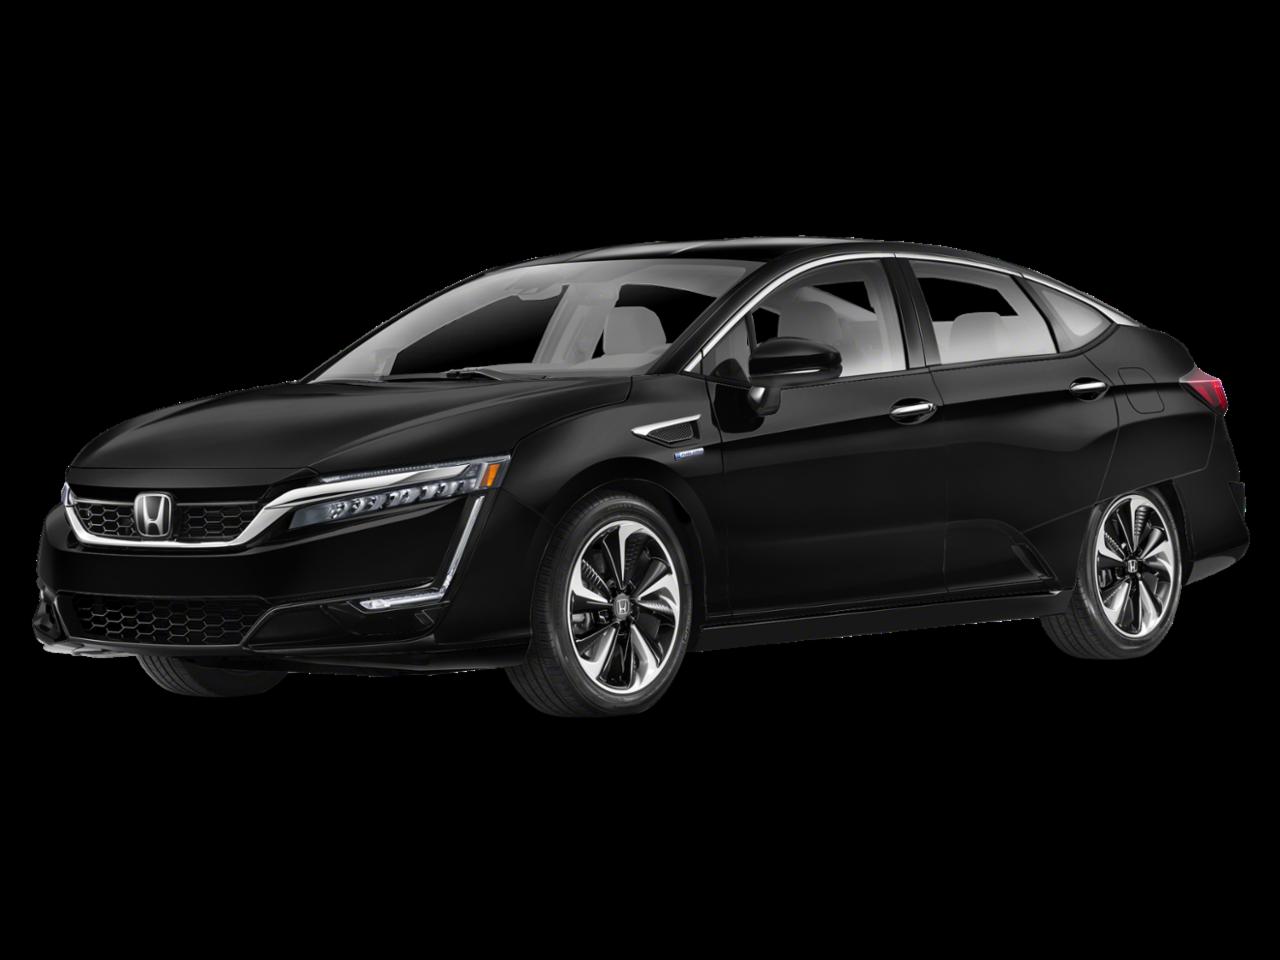 Honda 2019 Clarity Fuel Cell Sedan